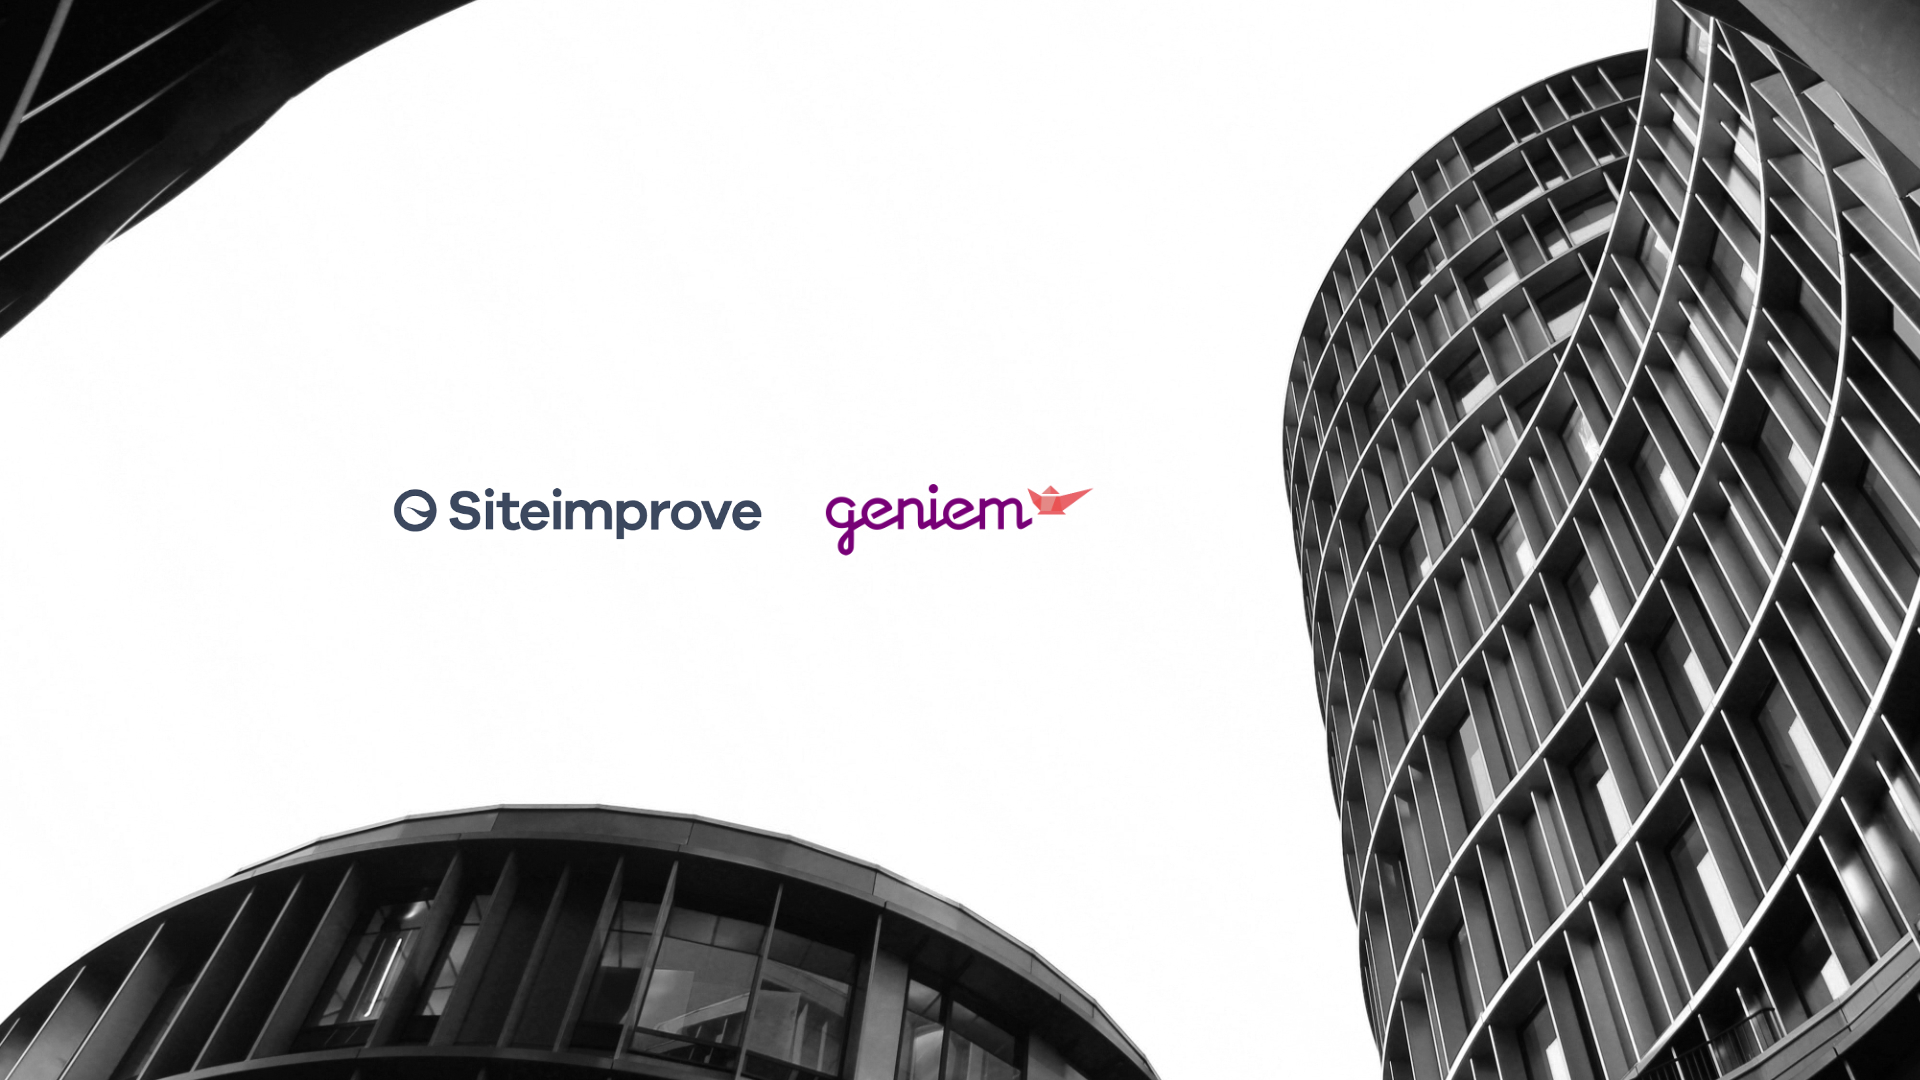 Siteimprove ja Geniem-logot (kuvituskuva)